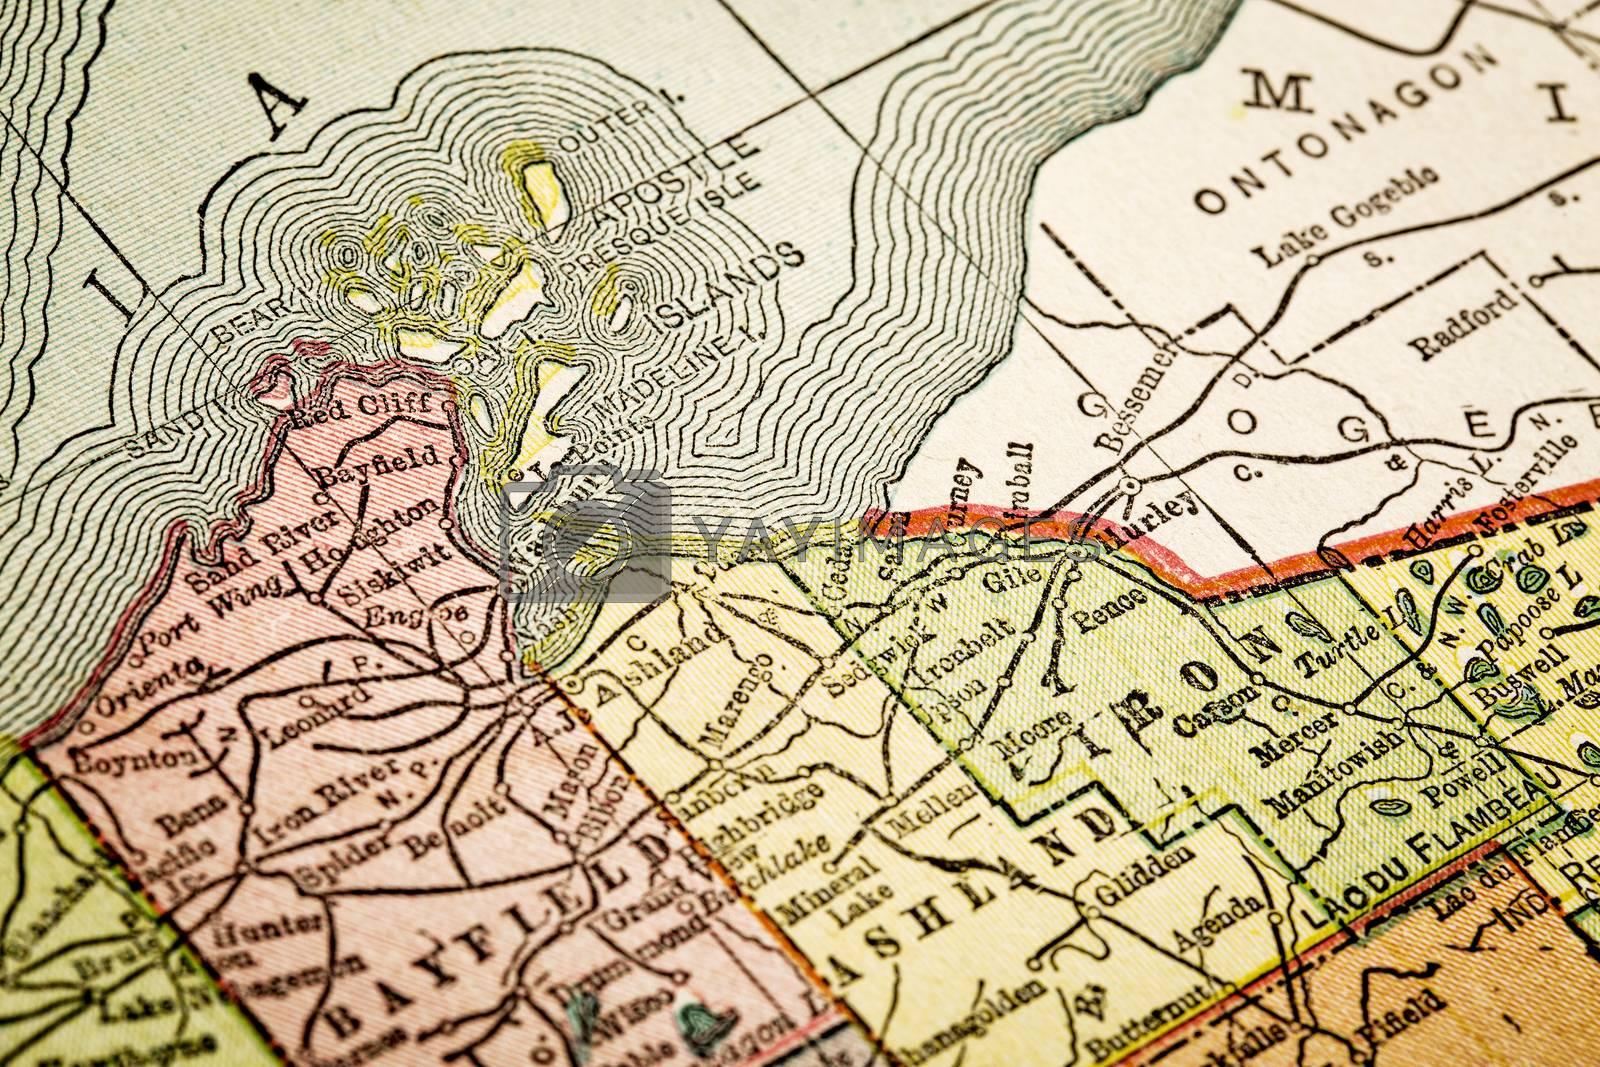 Apostle Islands on vintage map by PixelsAway